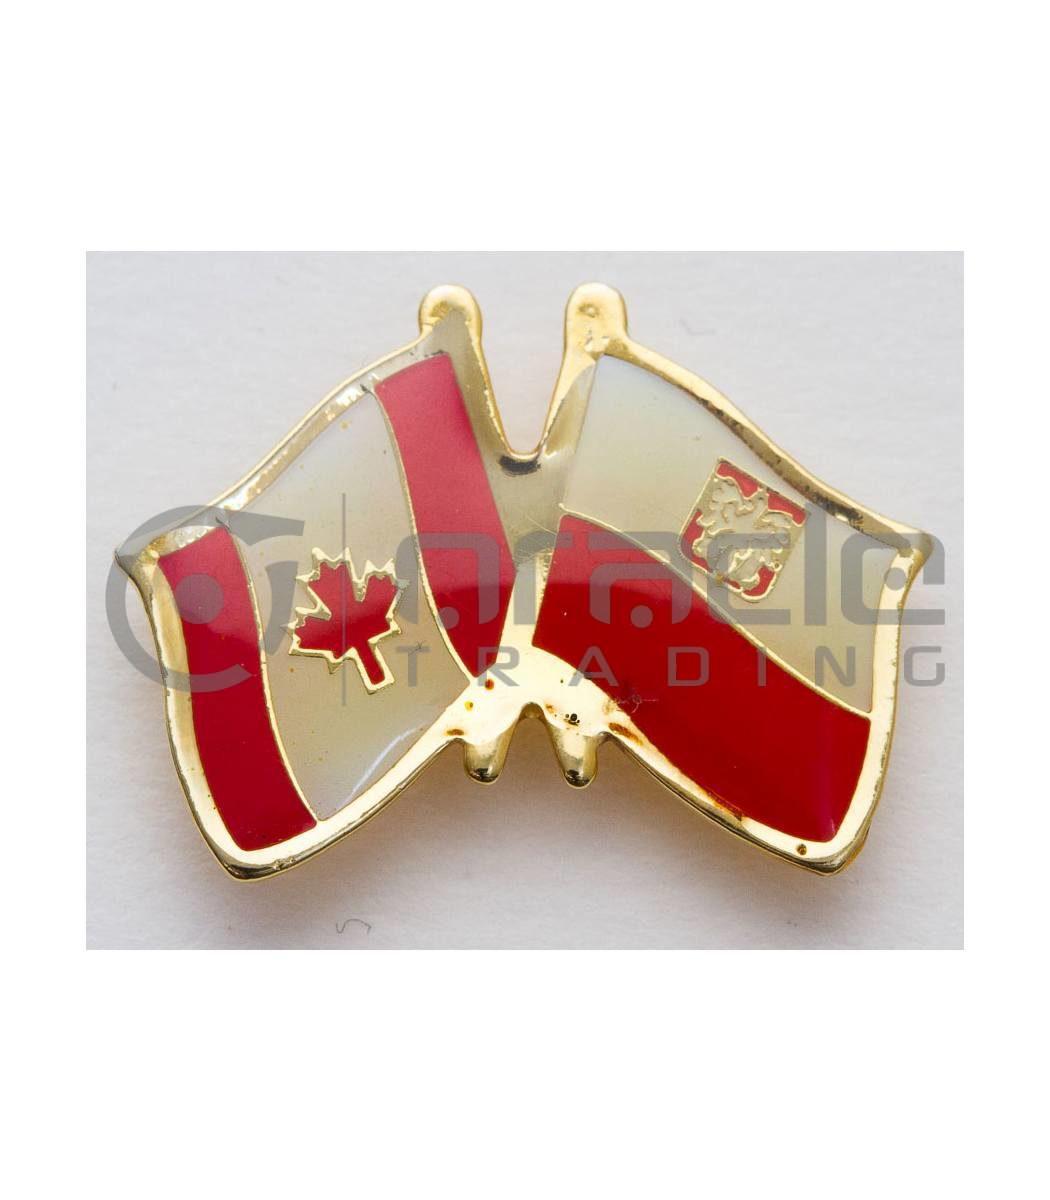 Poland / Canada Friendship Lapel Pin